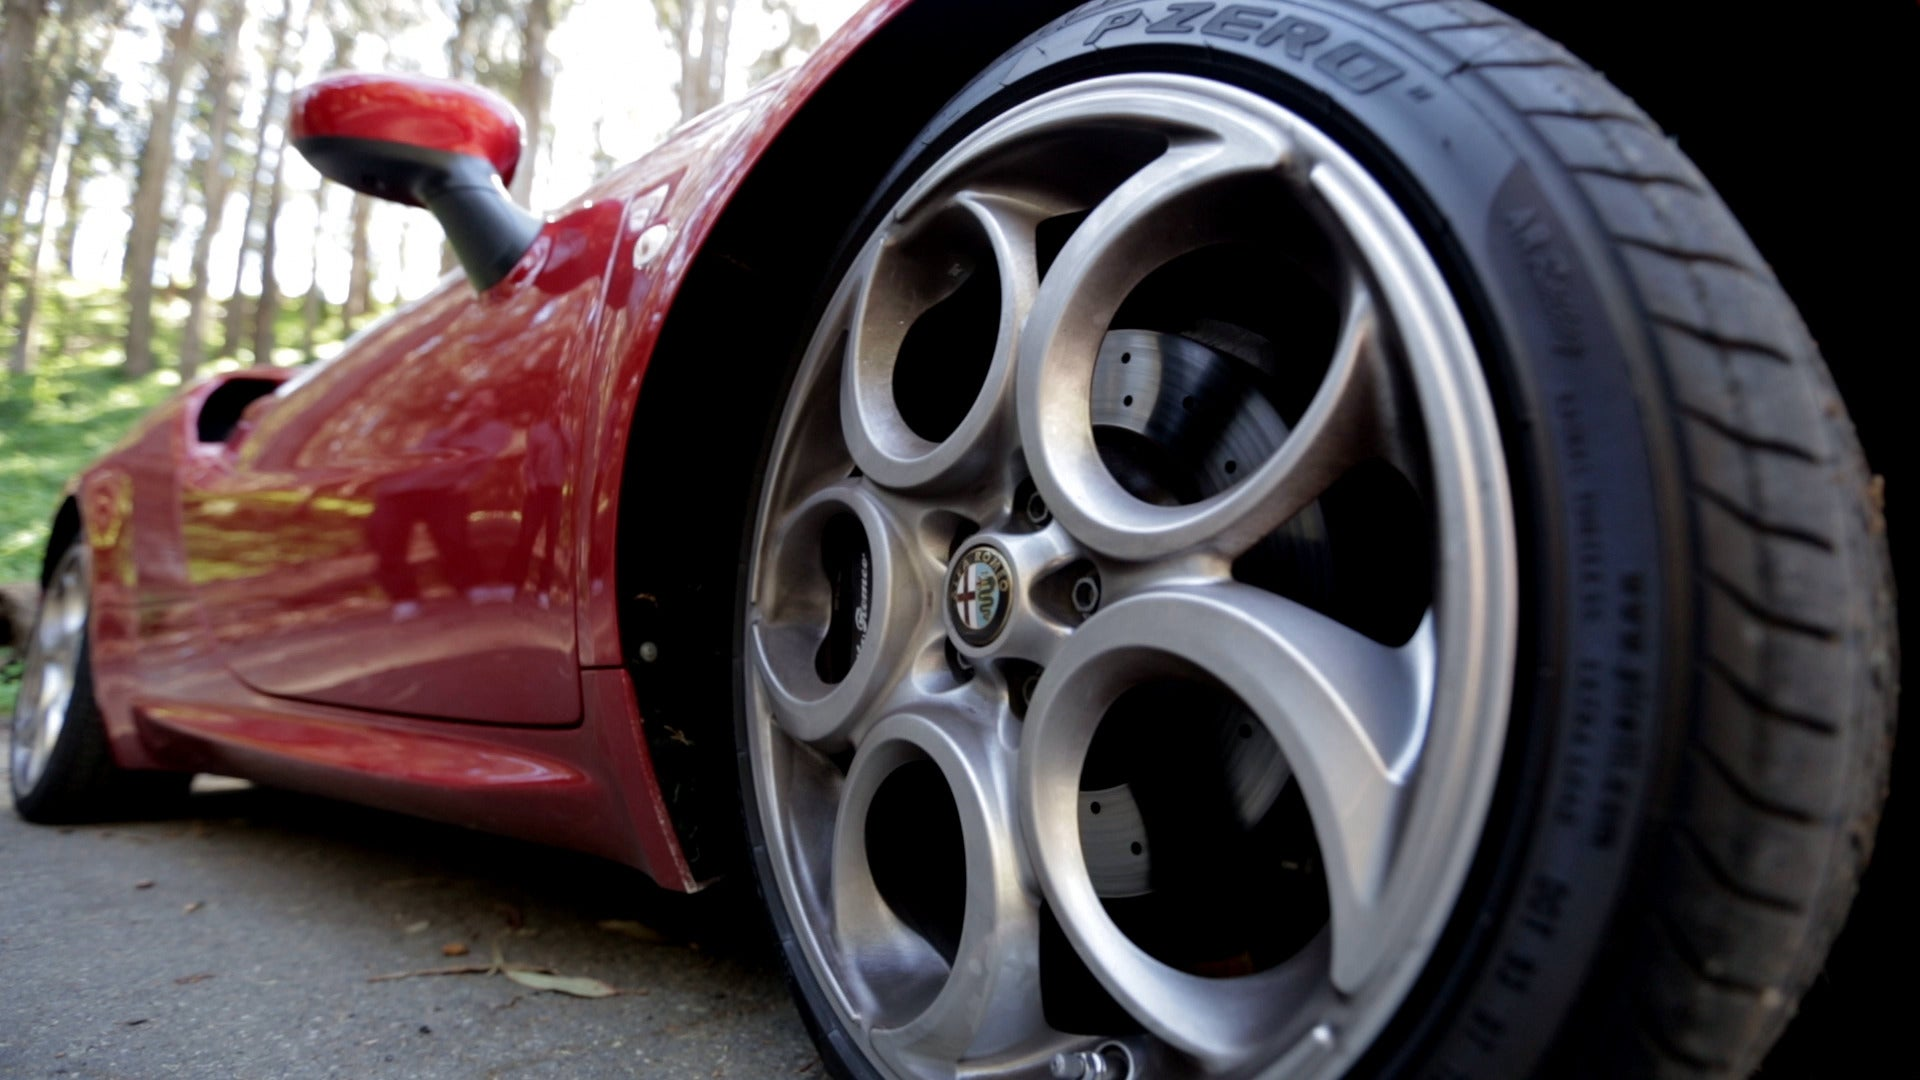 Pirelli P Zero >> Alfa Romeo 4C review: A snarling high-tech response to ...